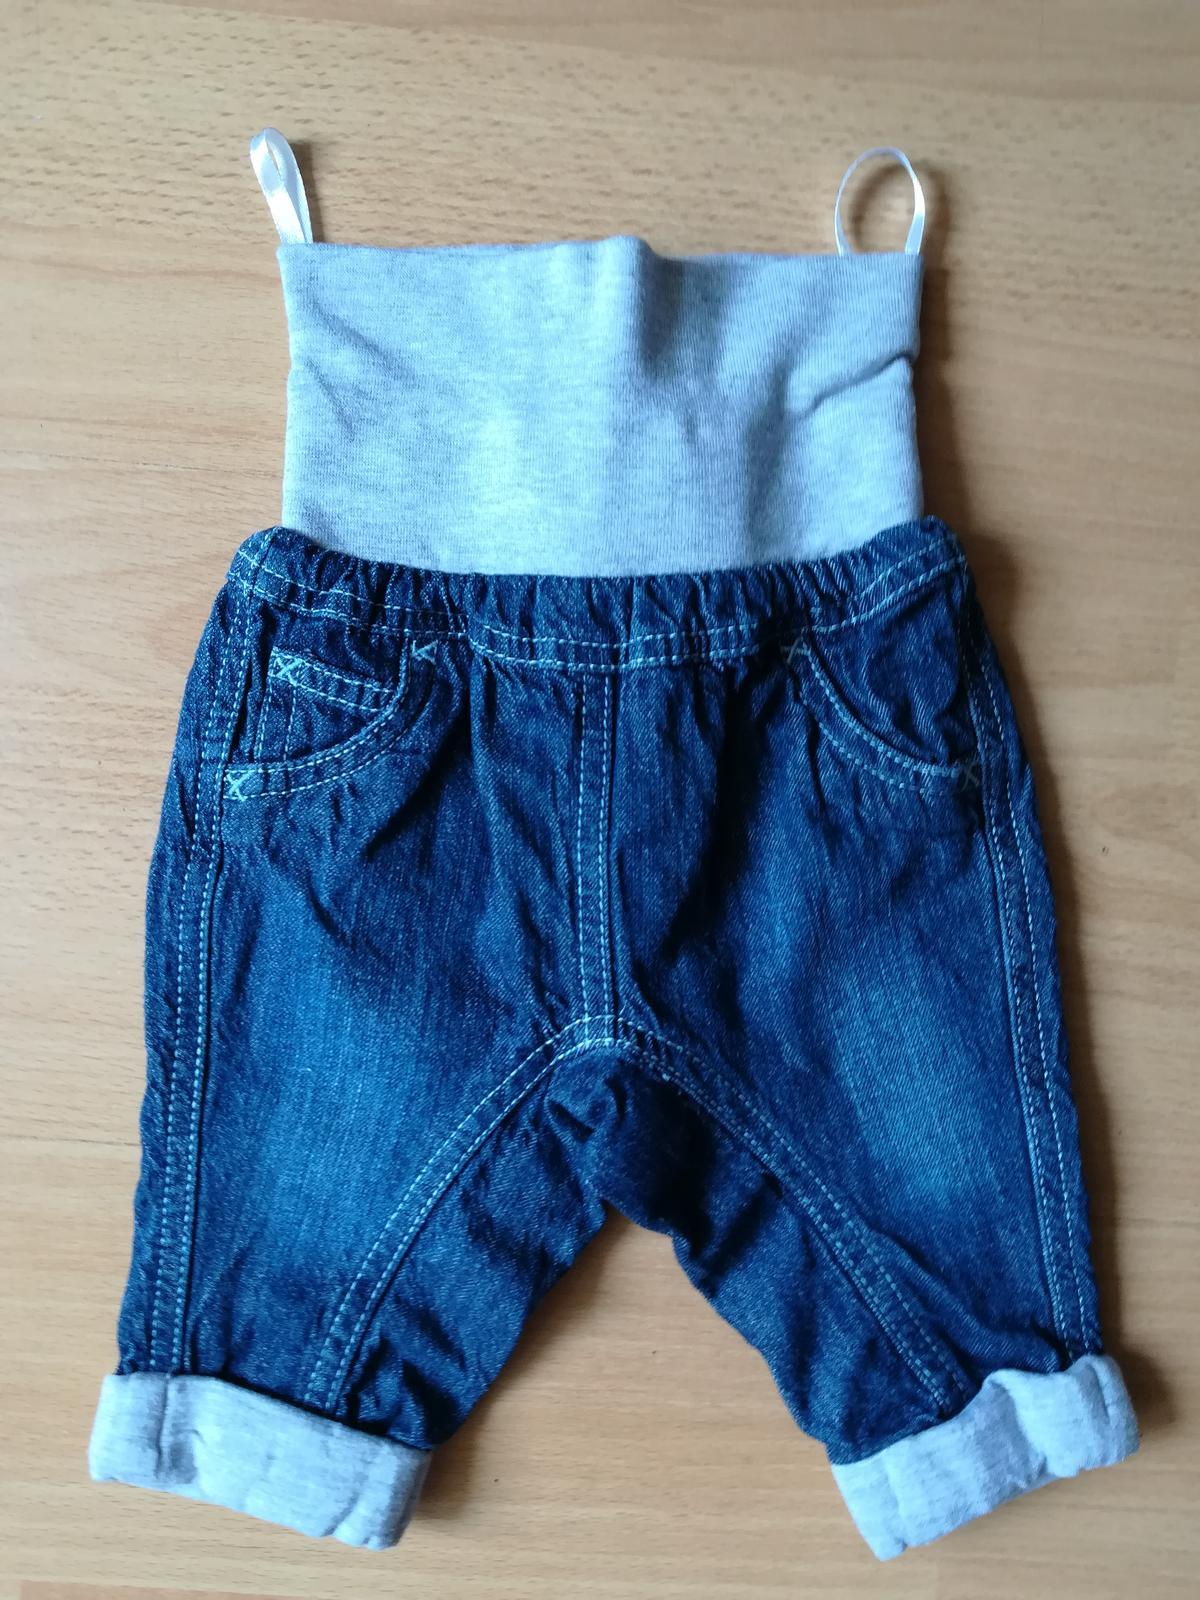 Detské riflové nohavice  Ergee  s vreckami, č.62 - Obrázek č. 1